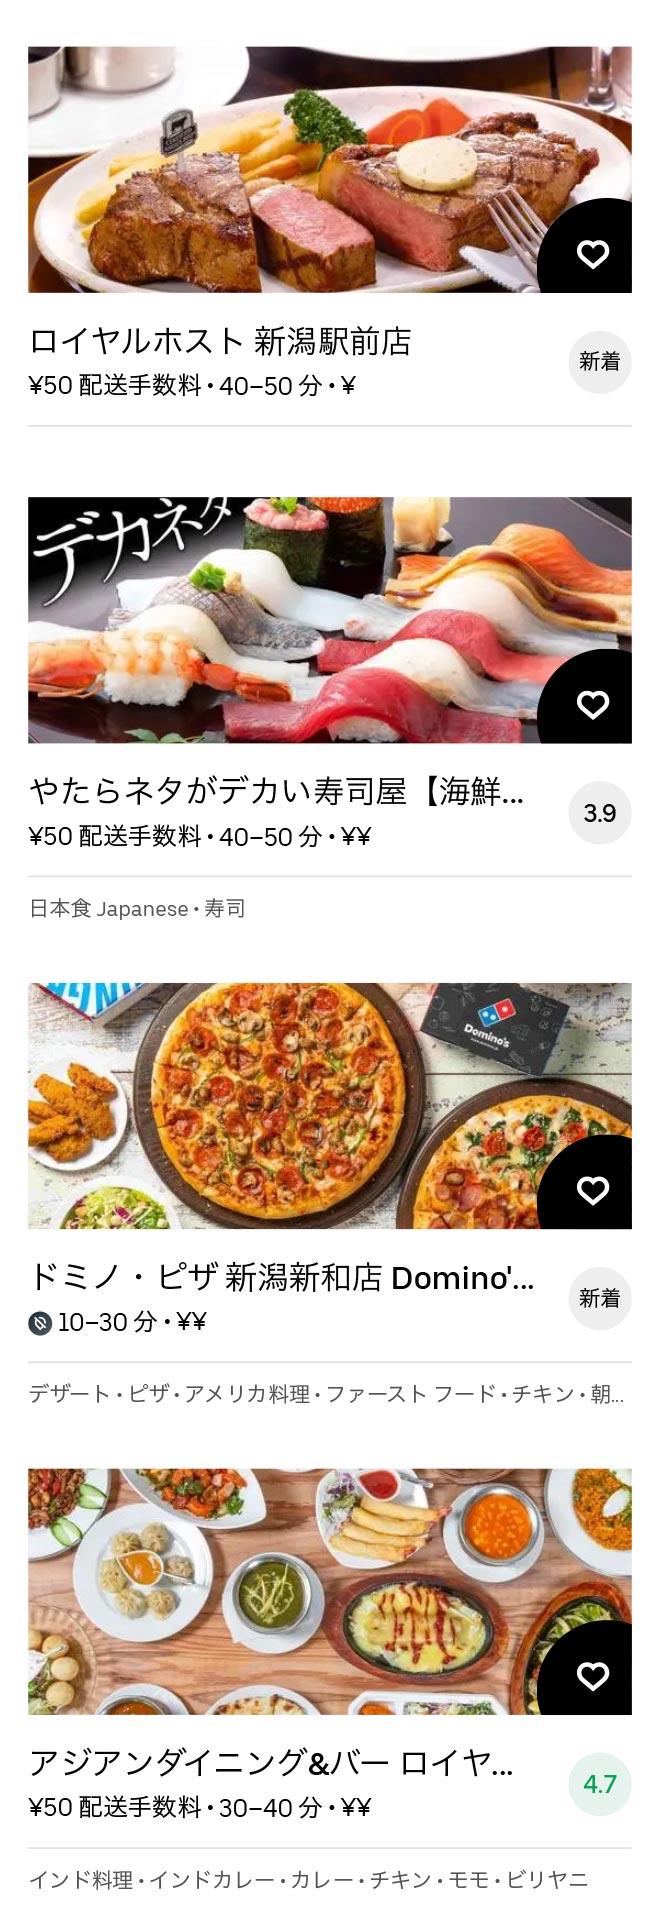 Niigata menu 2011 12